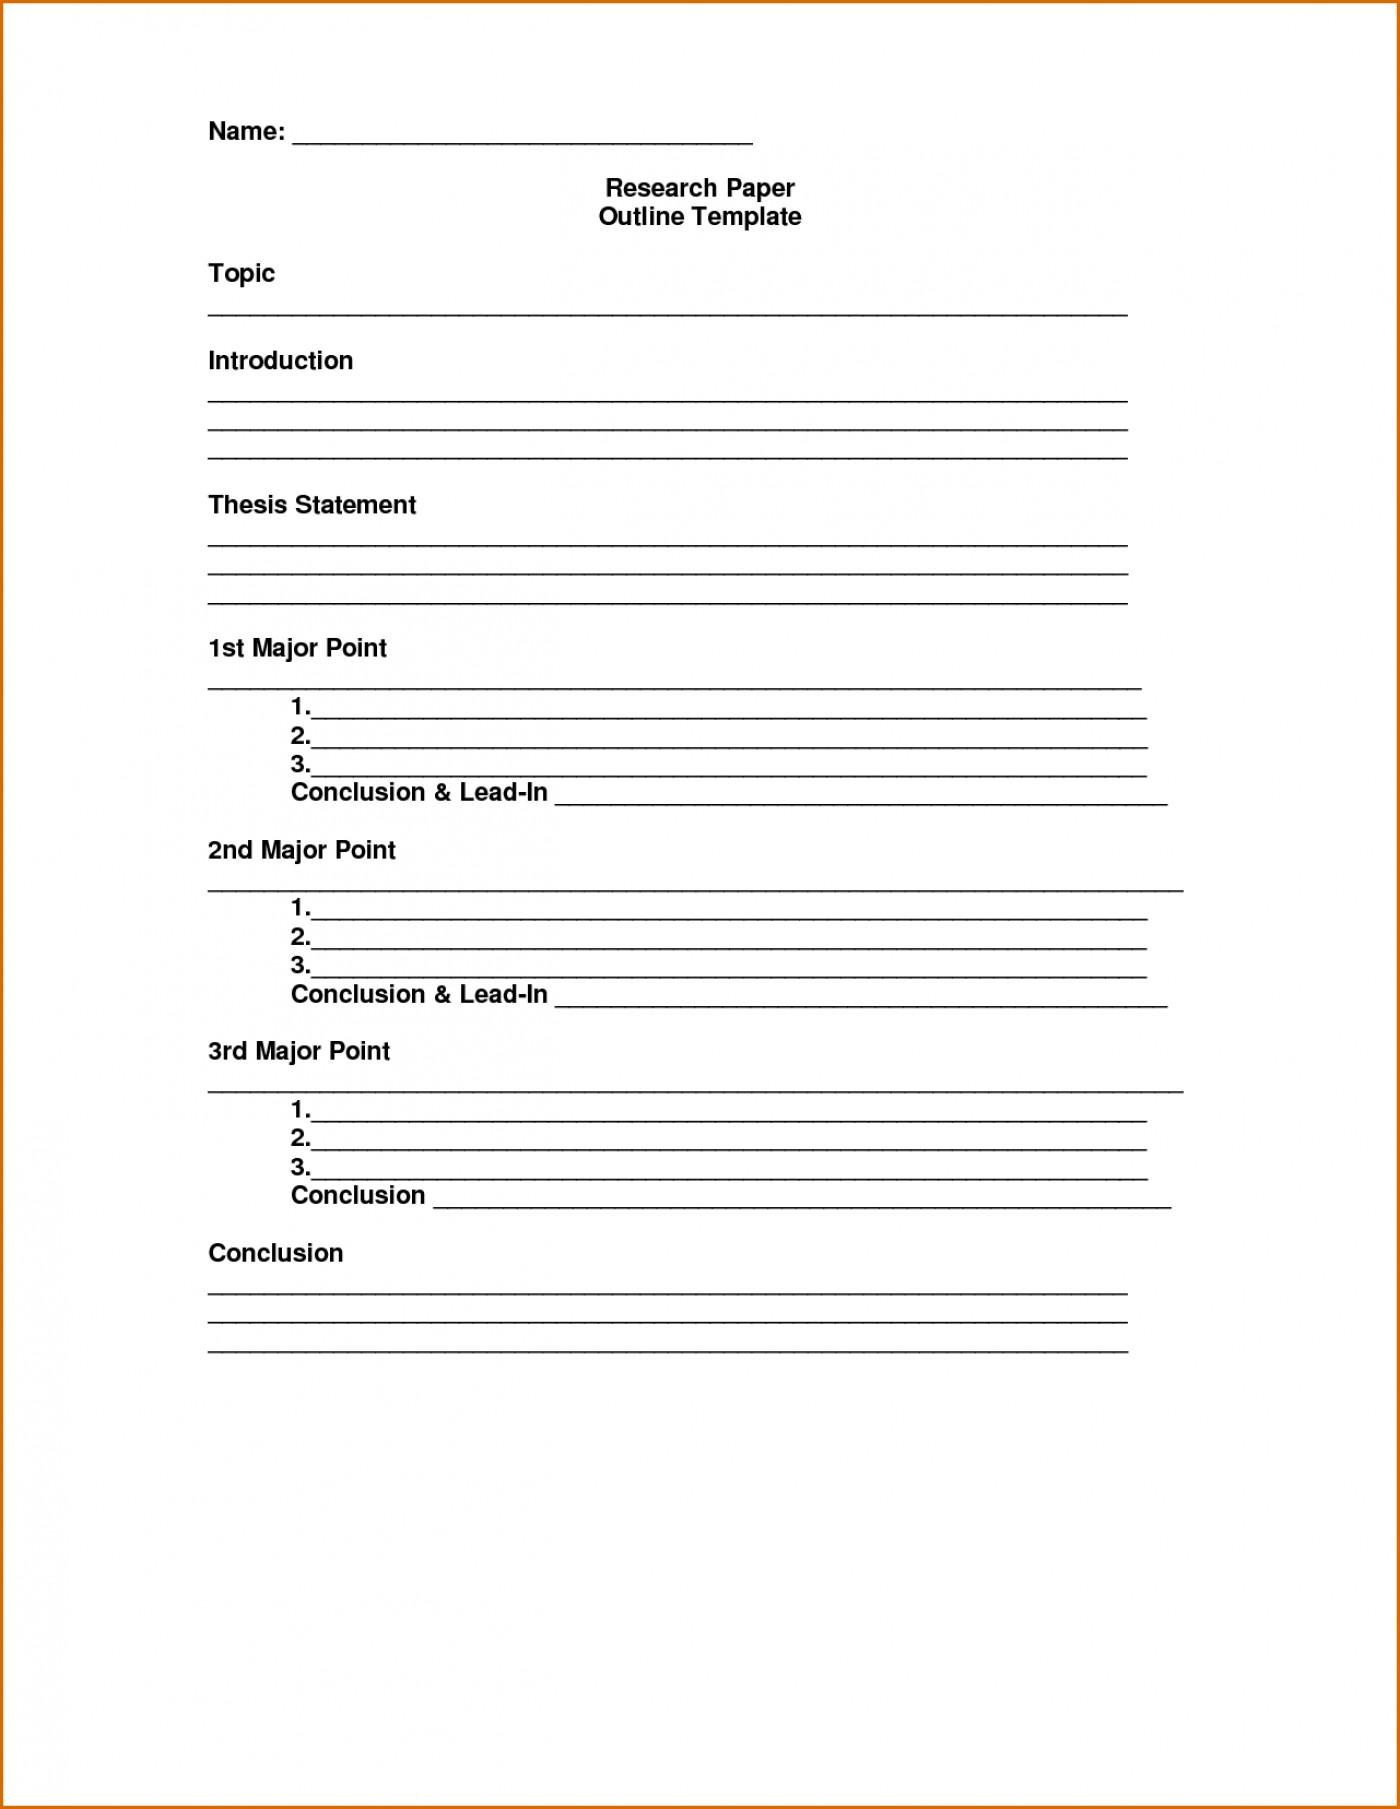 005 Essay Outline Template Excellent Mla Argumentative High School Research Paper Pdf 1400